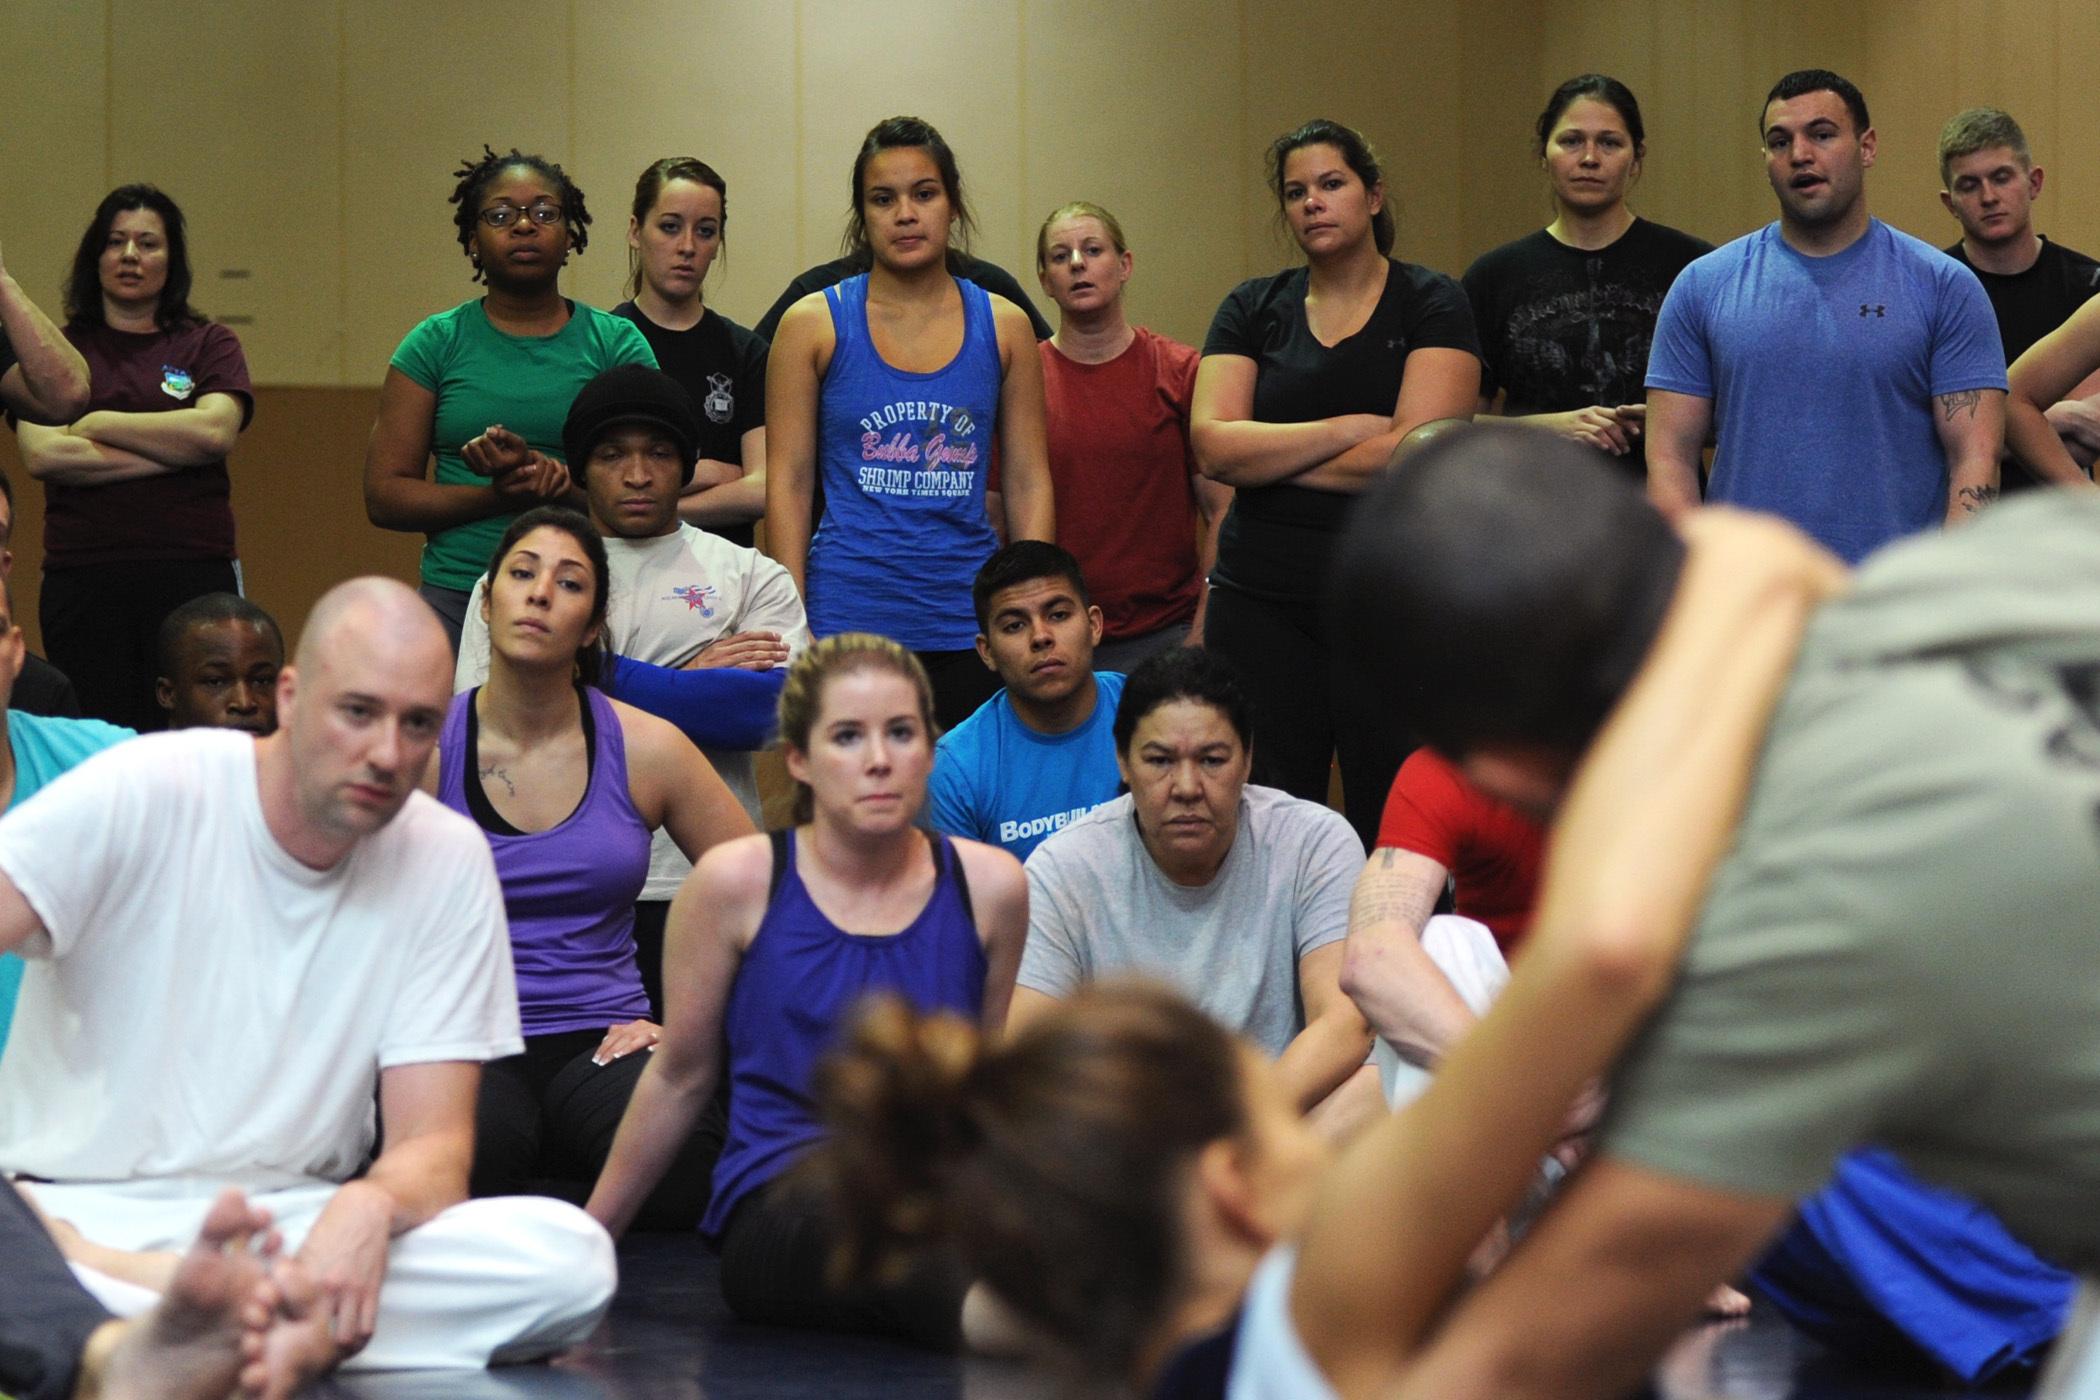 Women_Empowered_seminar_instills_jiu-jitsu,_self-defense_strategies_131112-F-ES731-059.jpg